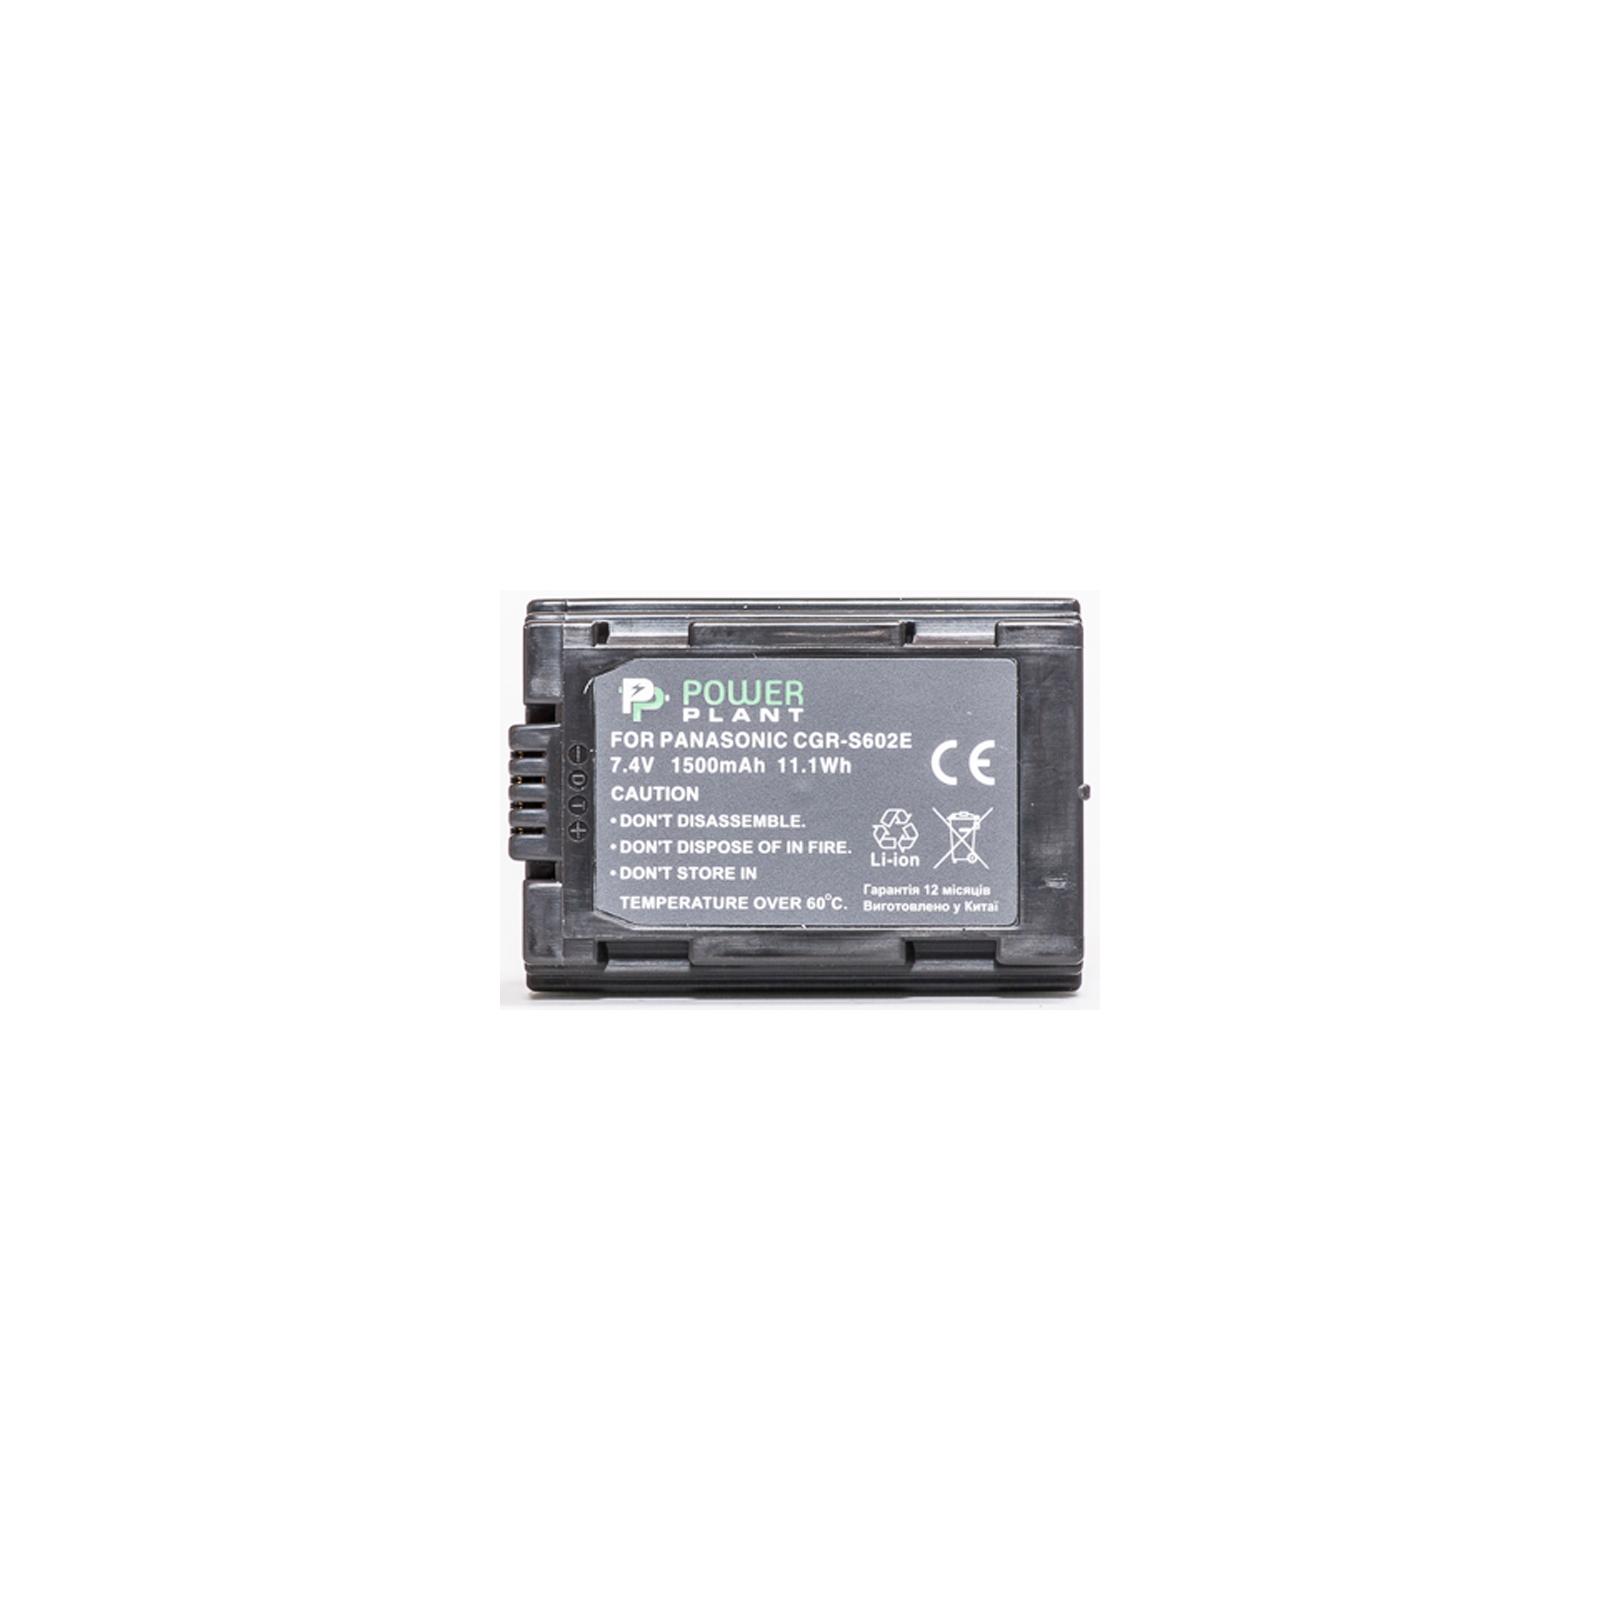 Аккумулятор к фото/видео PowerPlant Panasonic DMW-BL14, CGR-S602E, BP-DC1, BP-DC3 (DV00DV1338) изображение 2